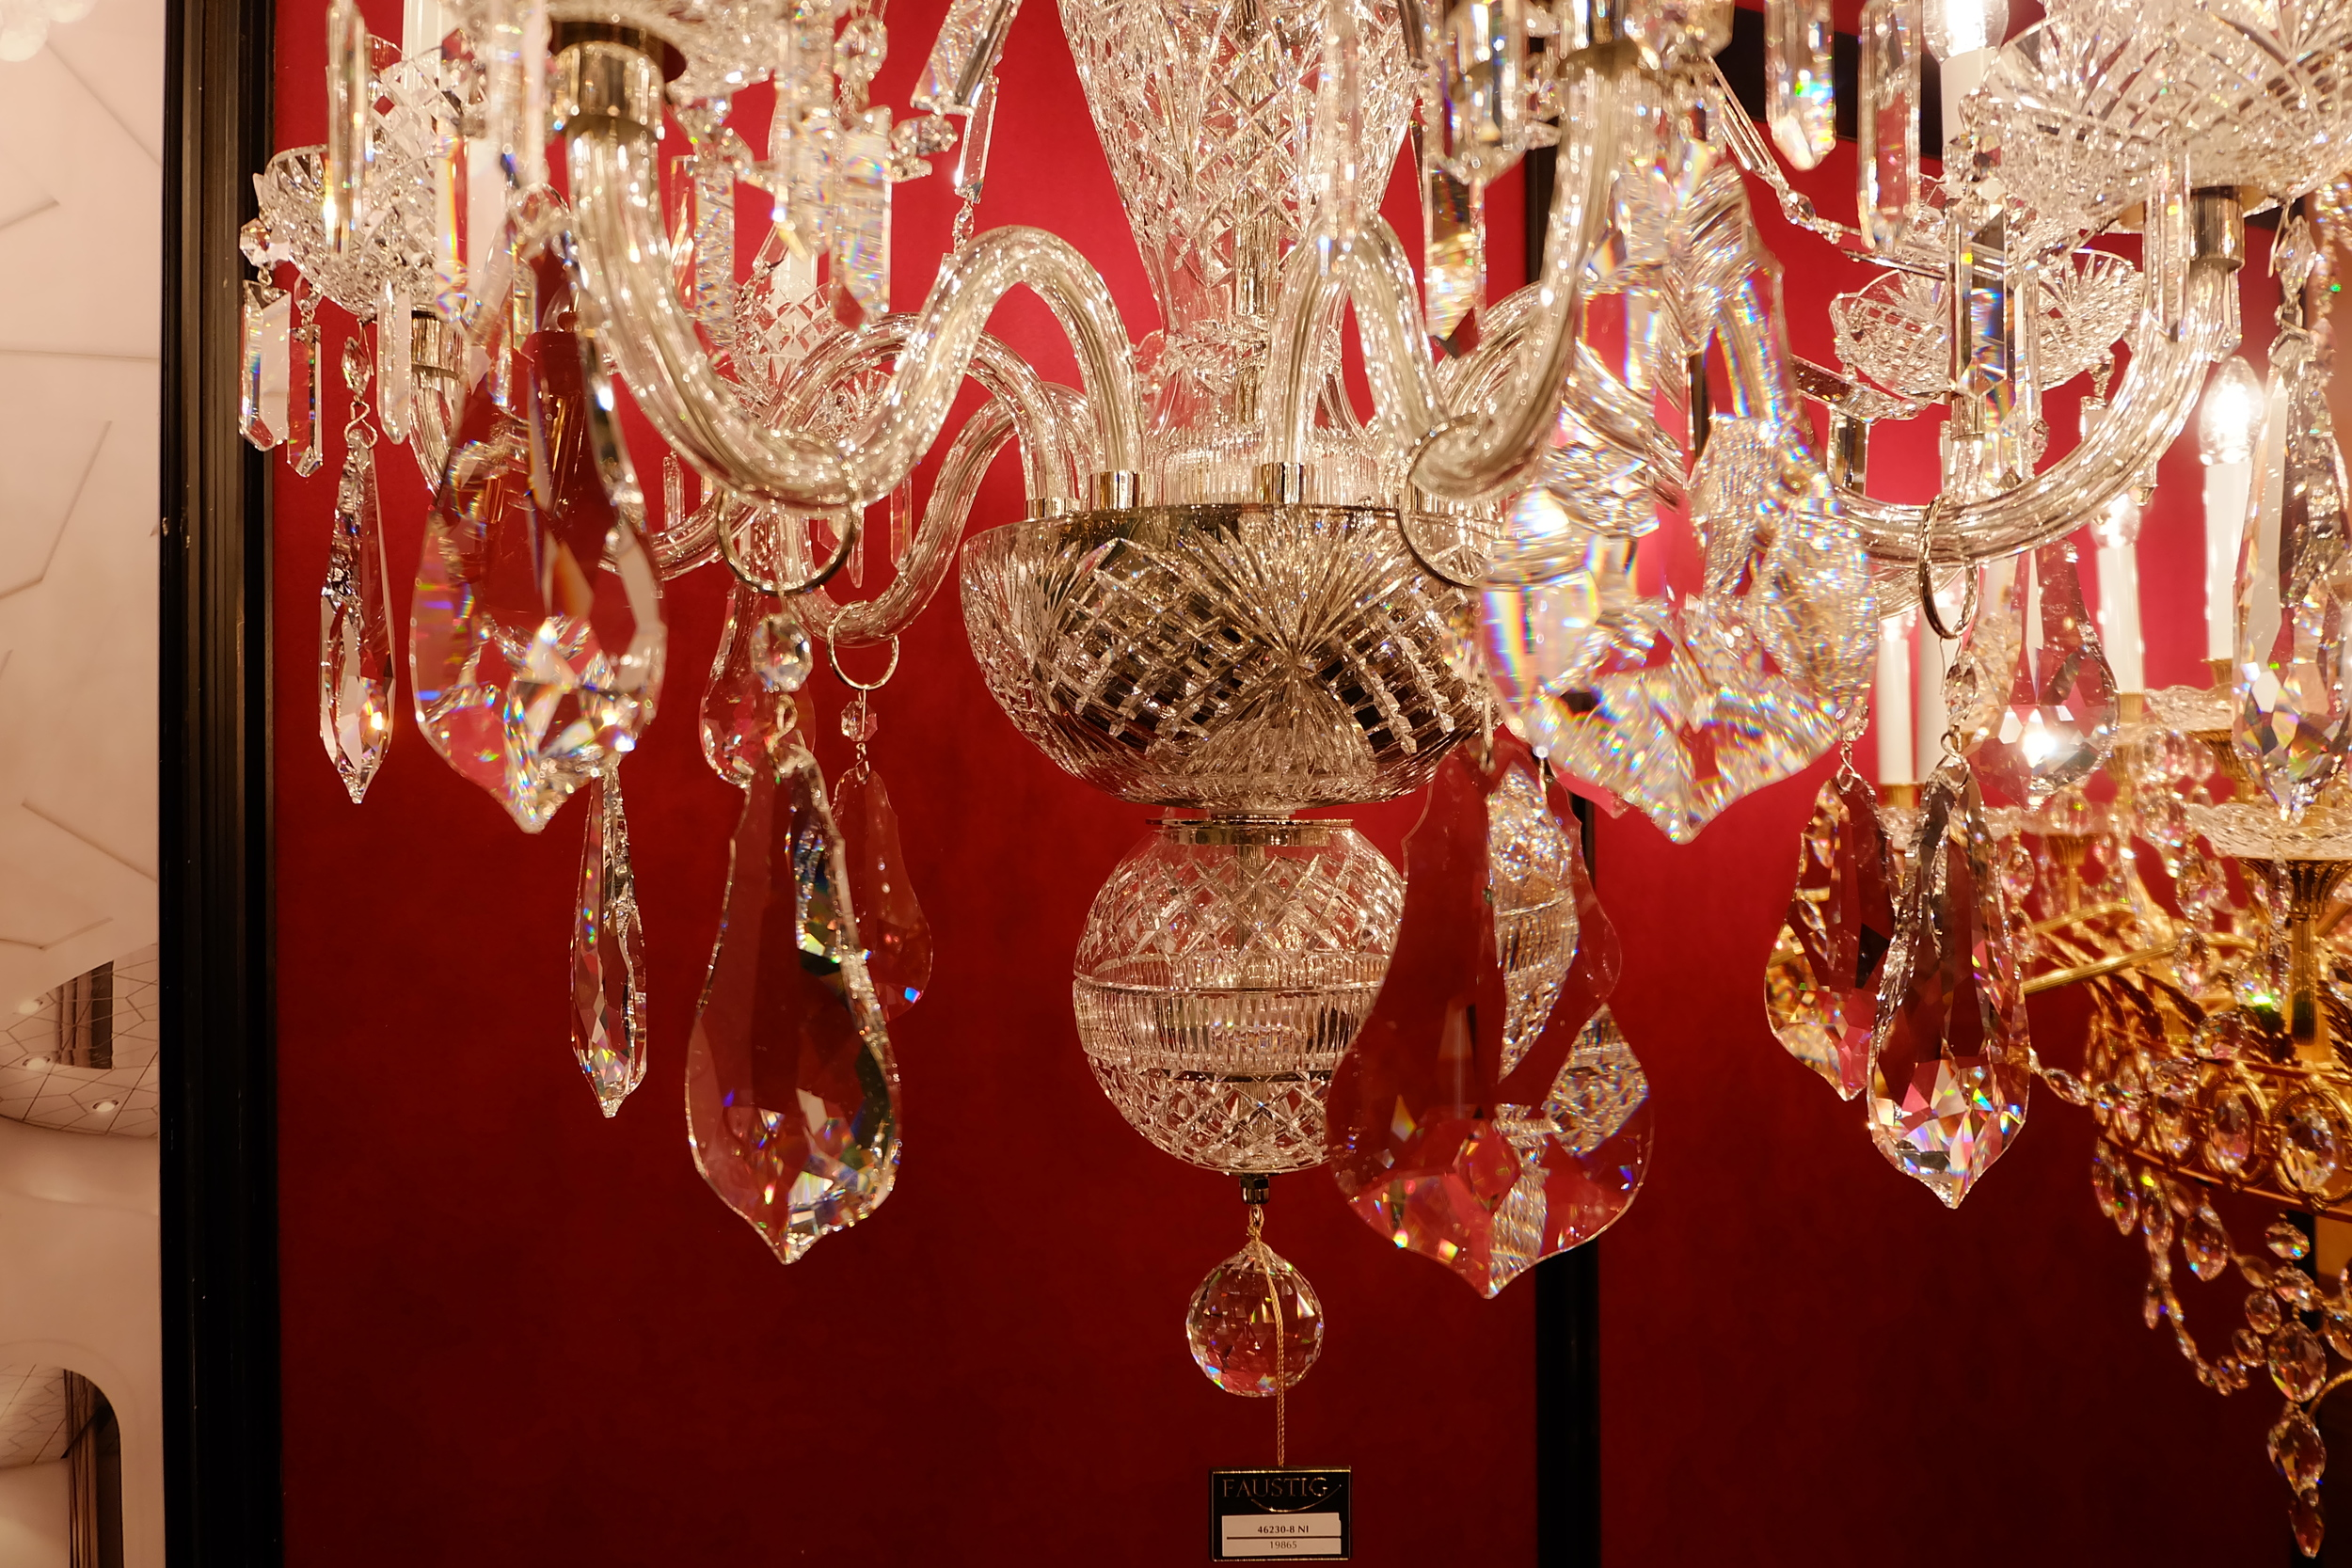 Maison & Objet 2016 Highlights - Timeless lighting classics: Swarovski crystal chandelier | MSH Agency